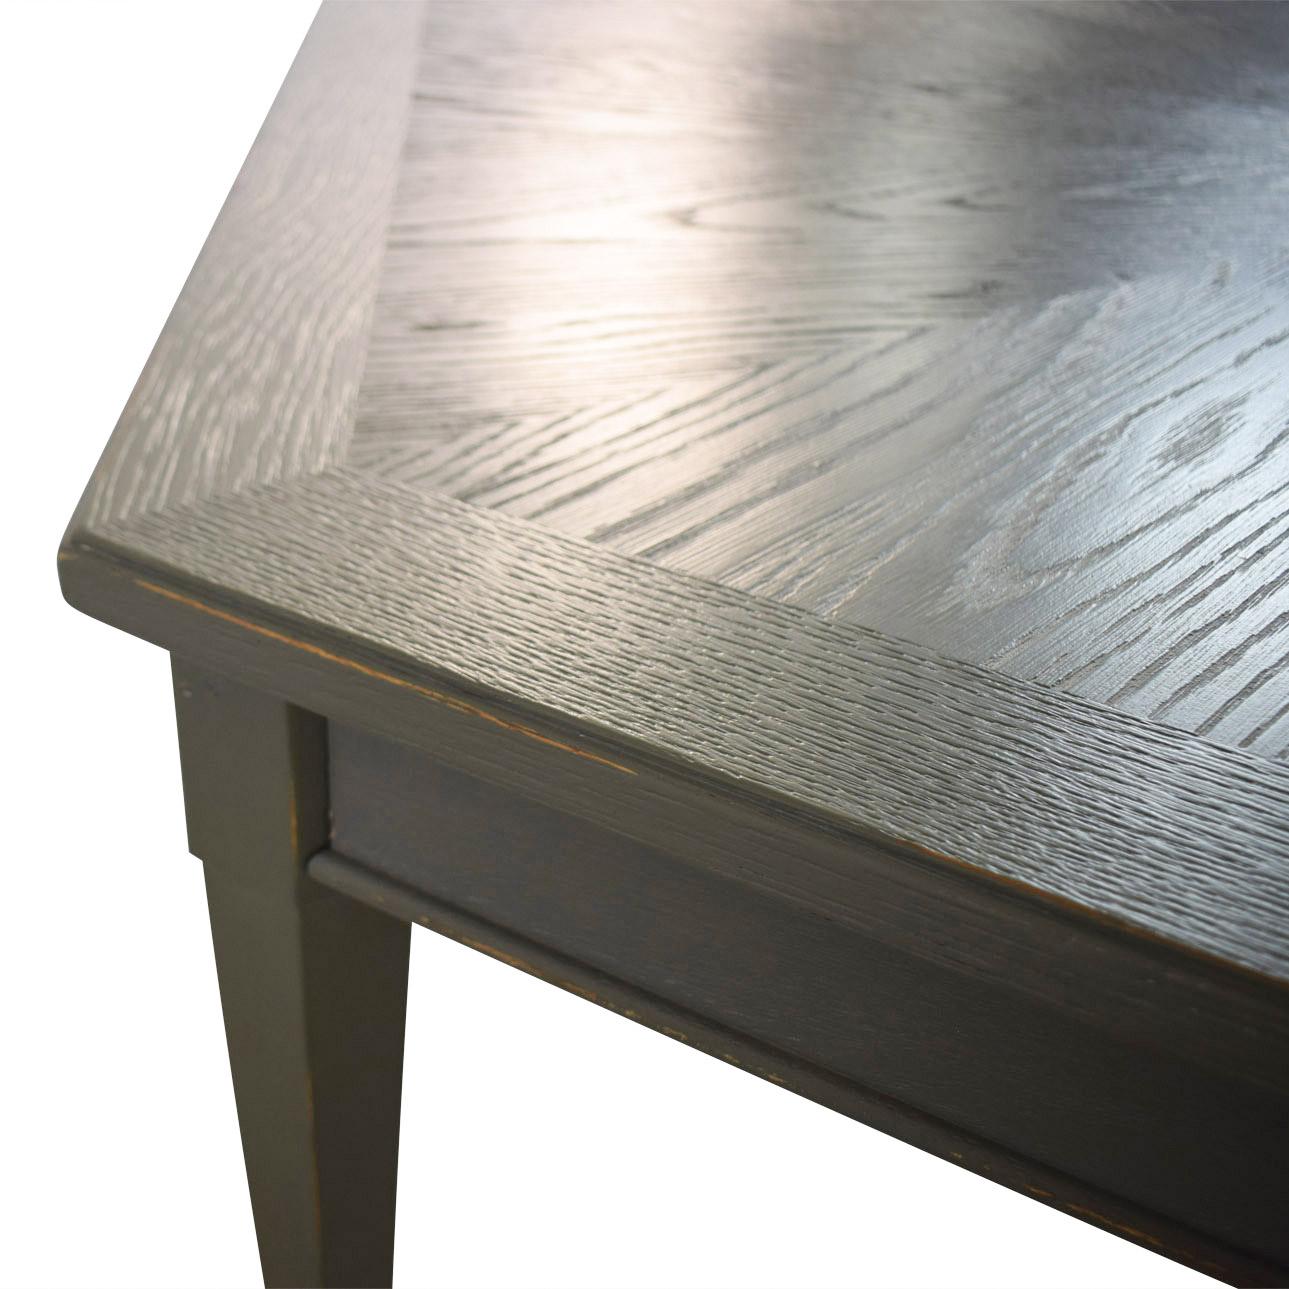 Stanley Furniture Stanley Furniture Soledad Promenade Leg Table used